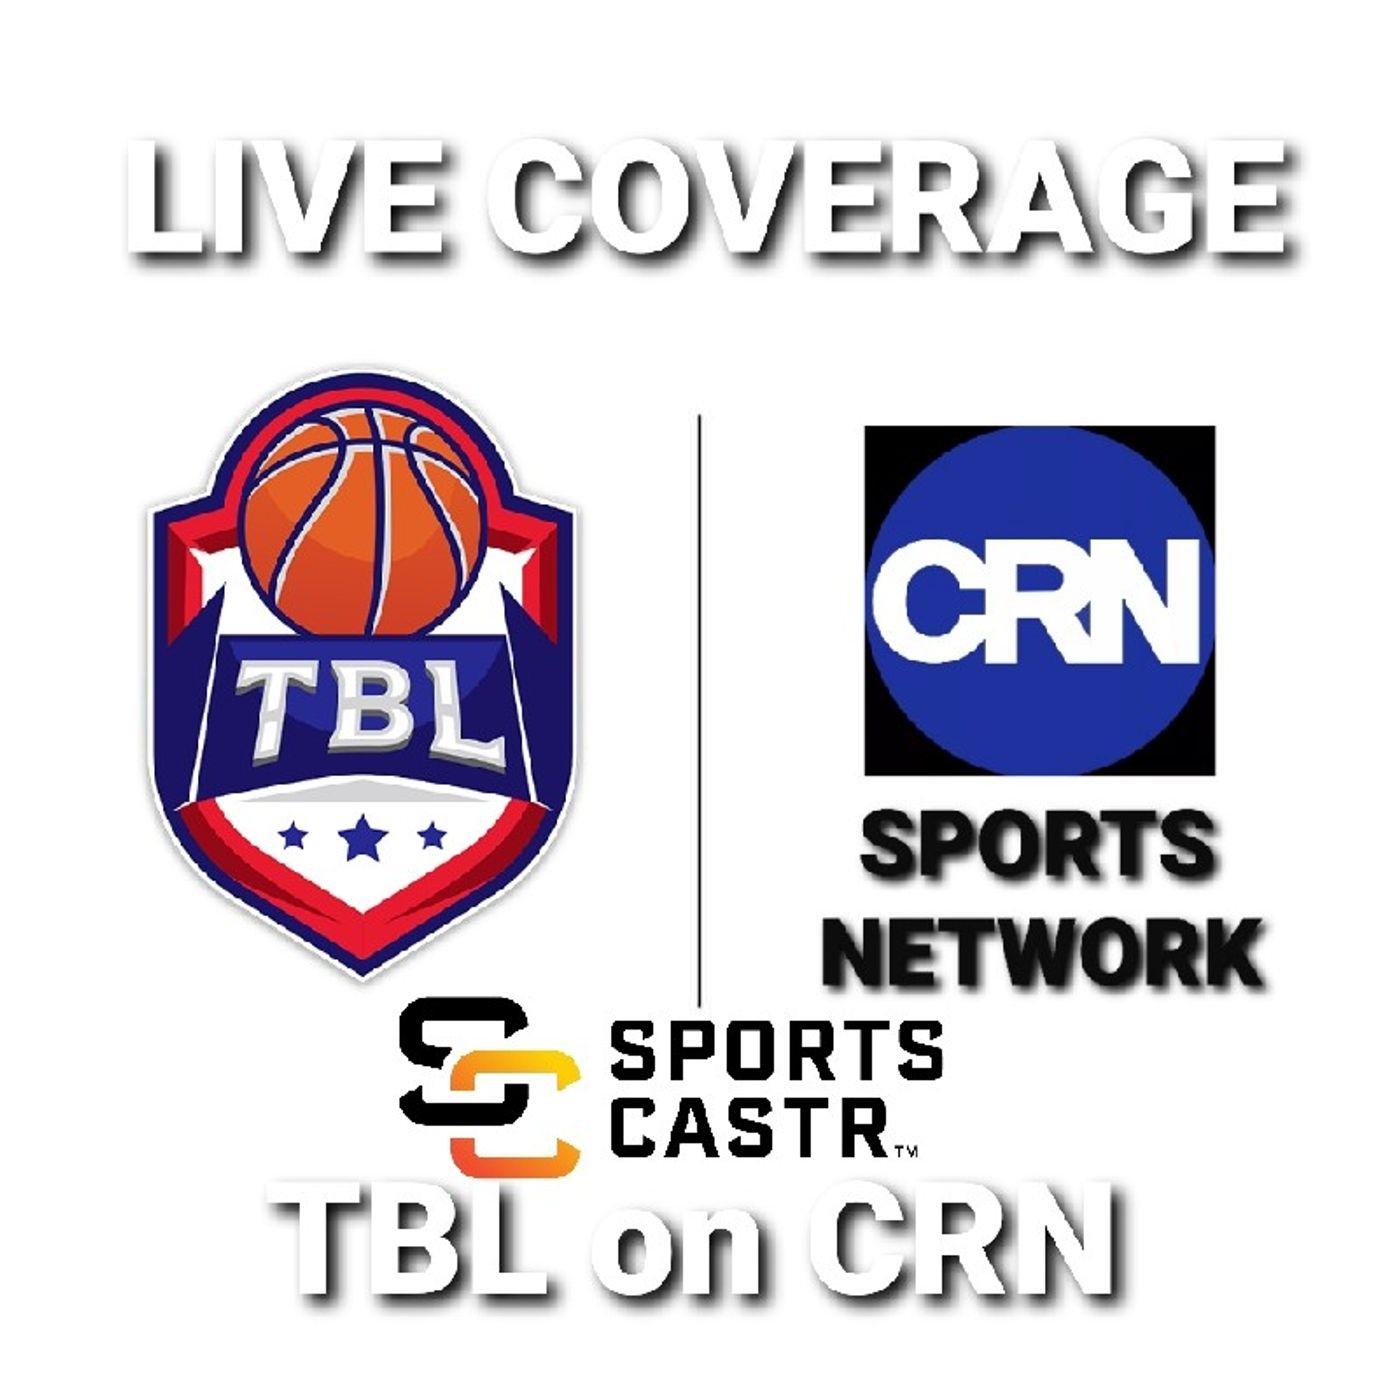 CRN Sports Coverage of #TBLonCRN Dallas Skyline vs Raleigh Firebirds! #CRNSports 🎙🏀